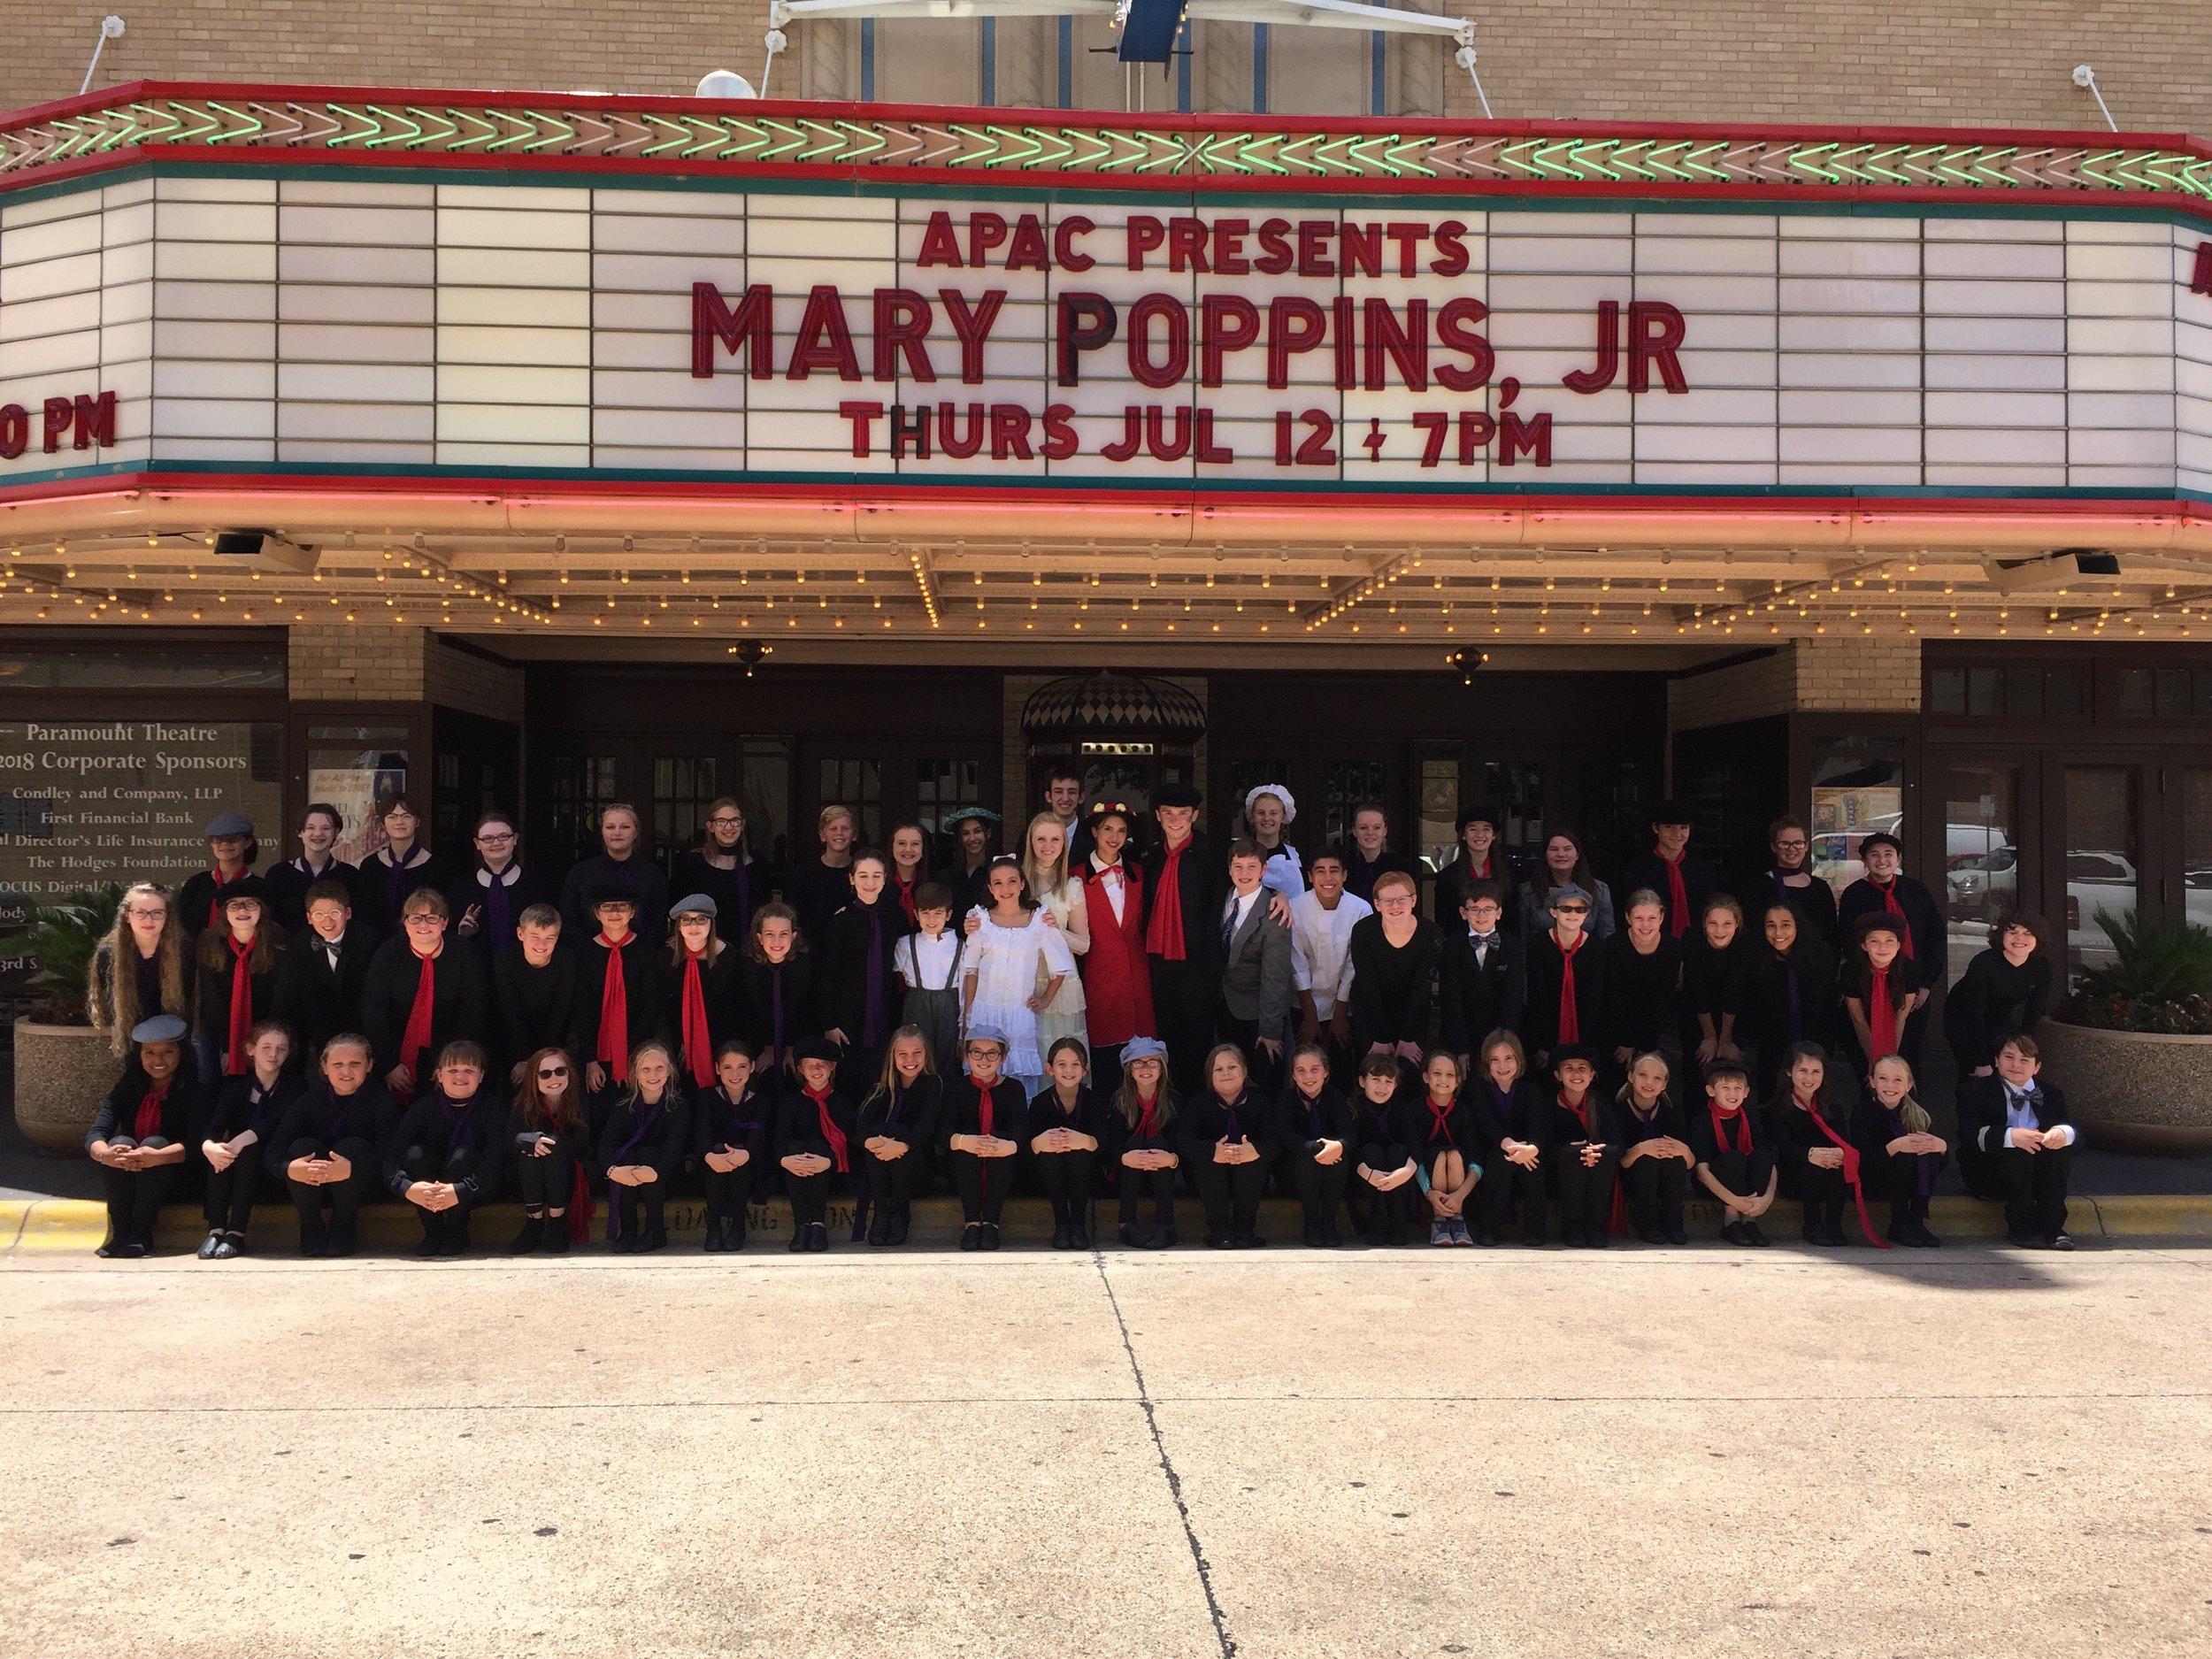 Mary Poppins 3.JPG